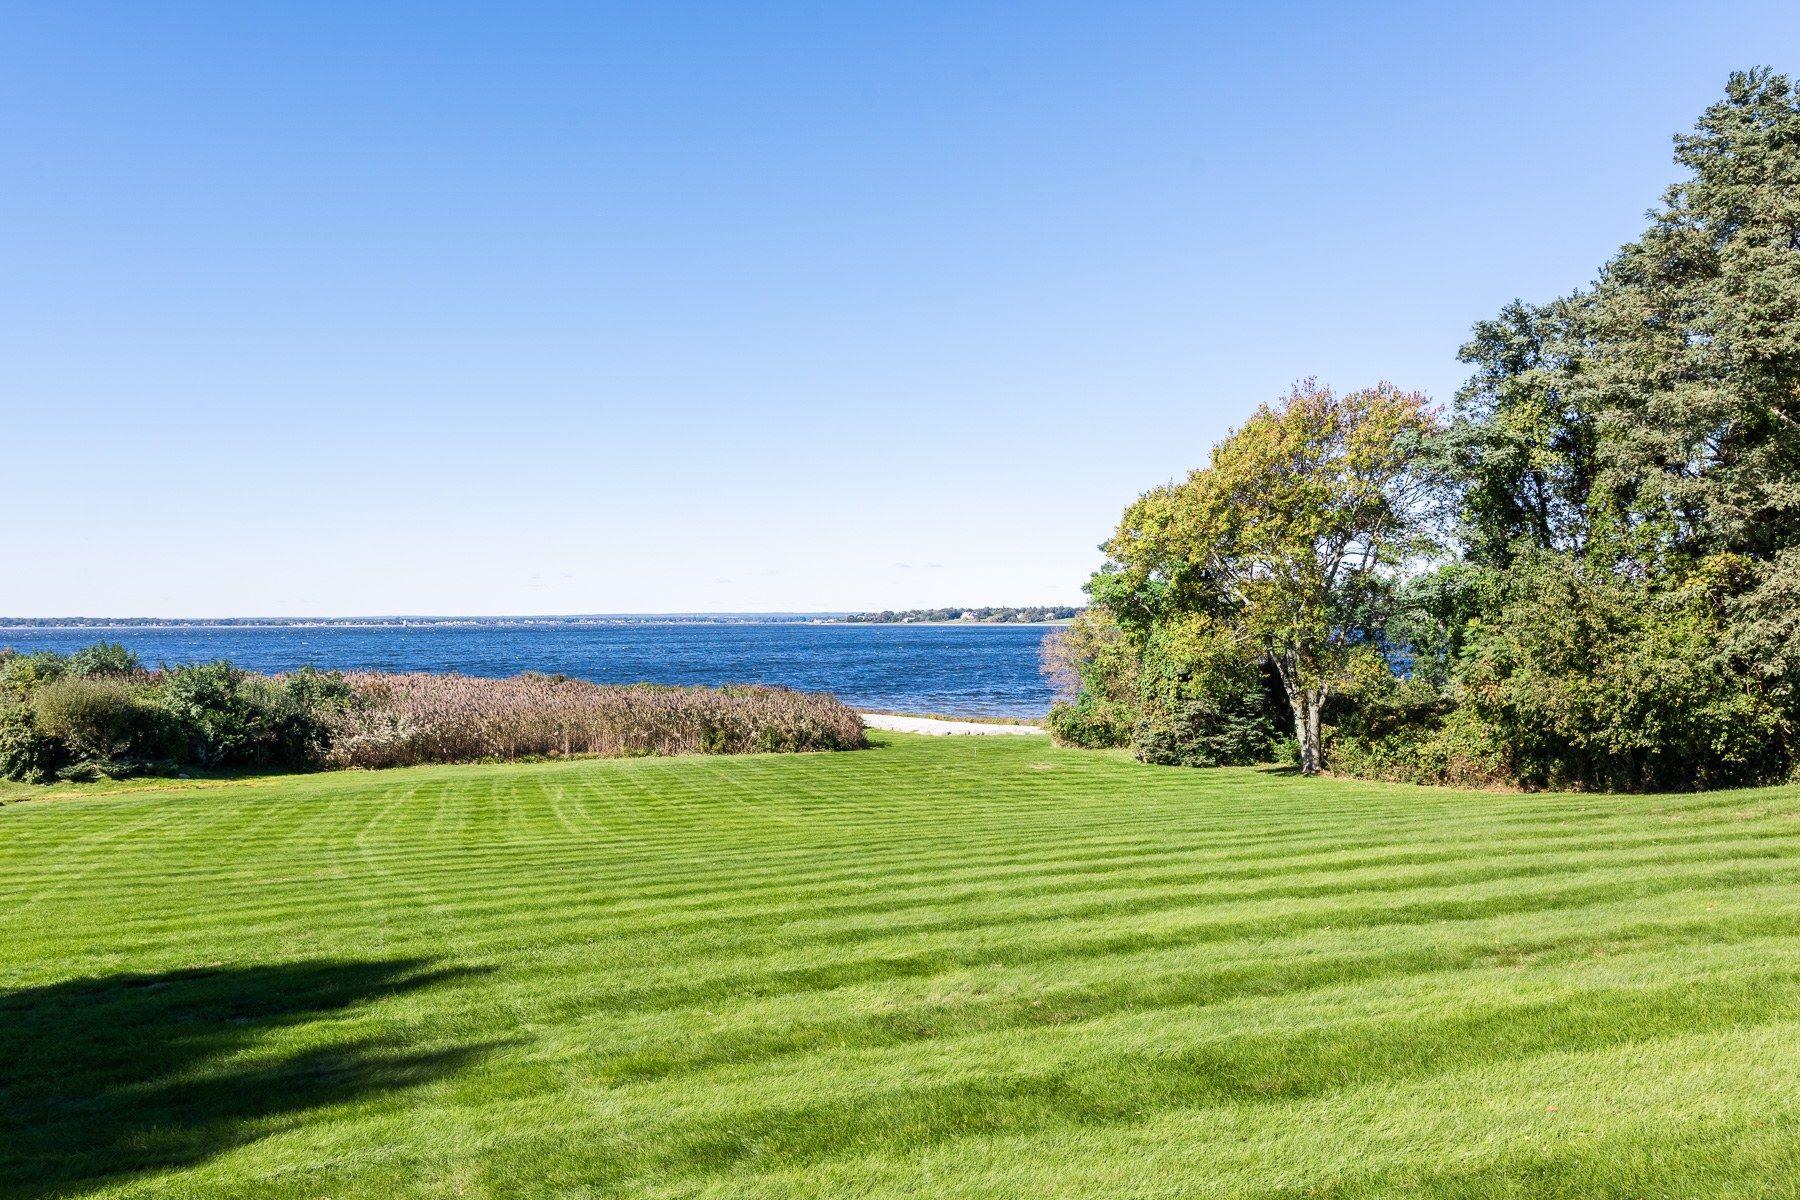 Land for Sale at 0 Pheasant Lane, Barrington, RI 0 Pheasant Lane Barrington, Rhode Island 02806 United States